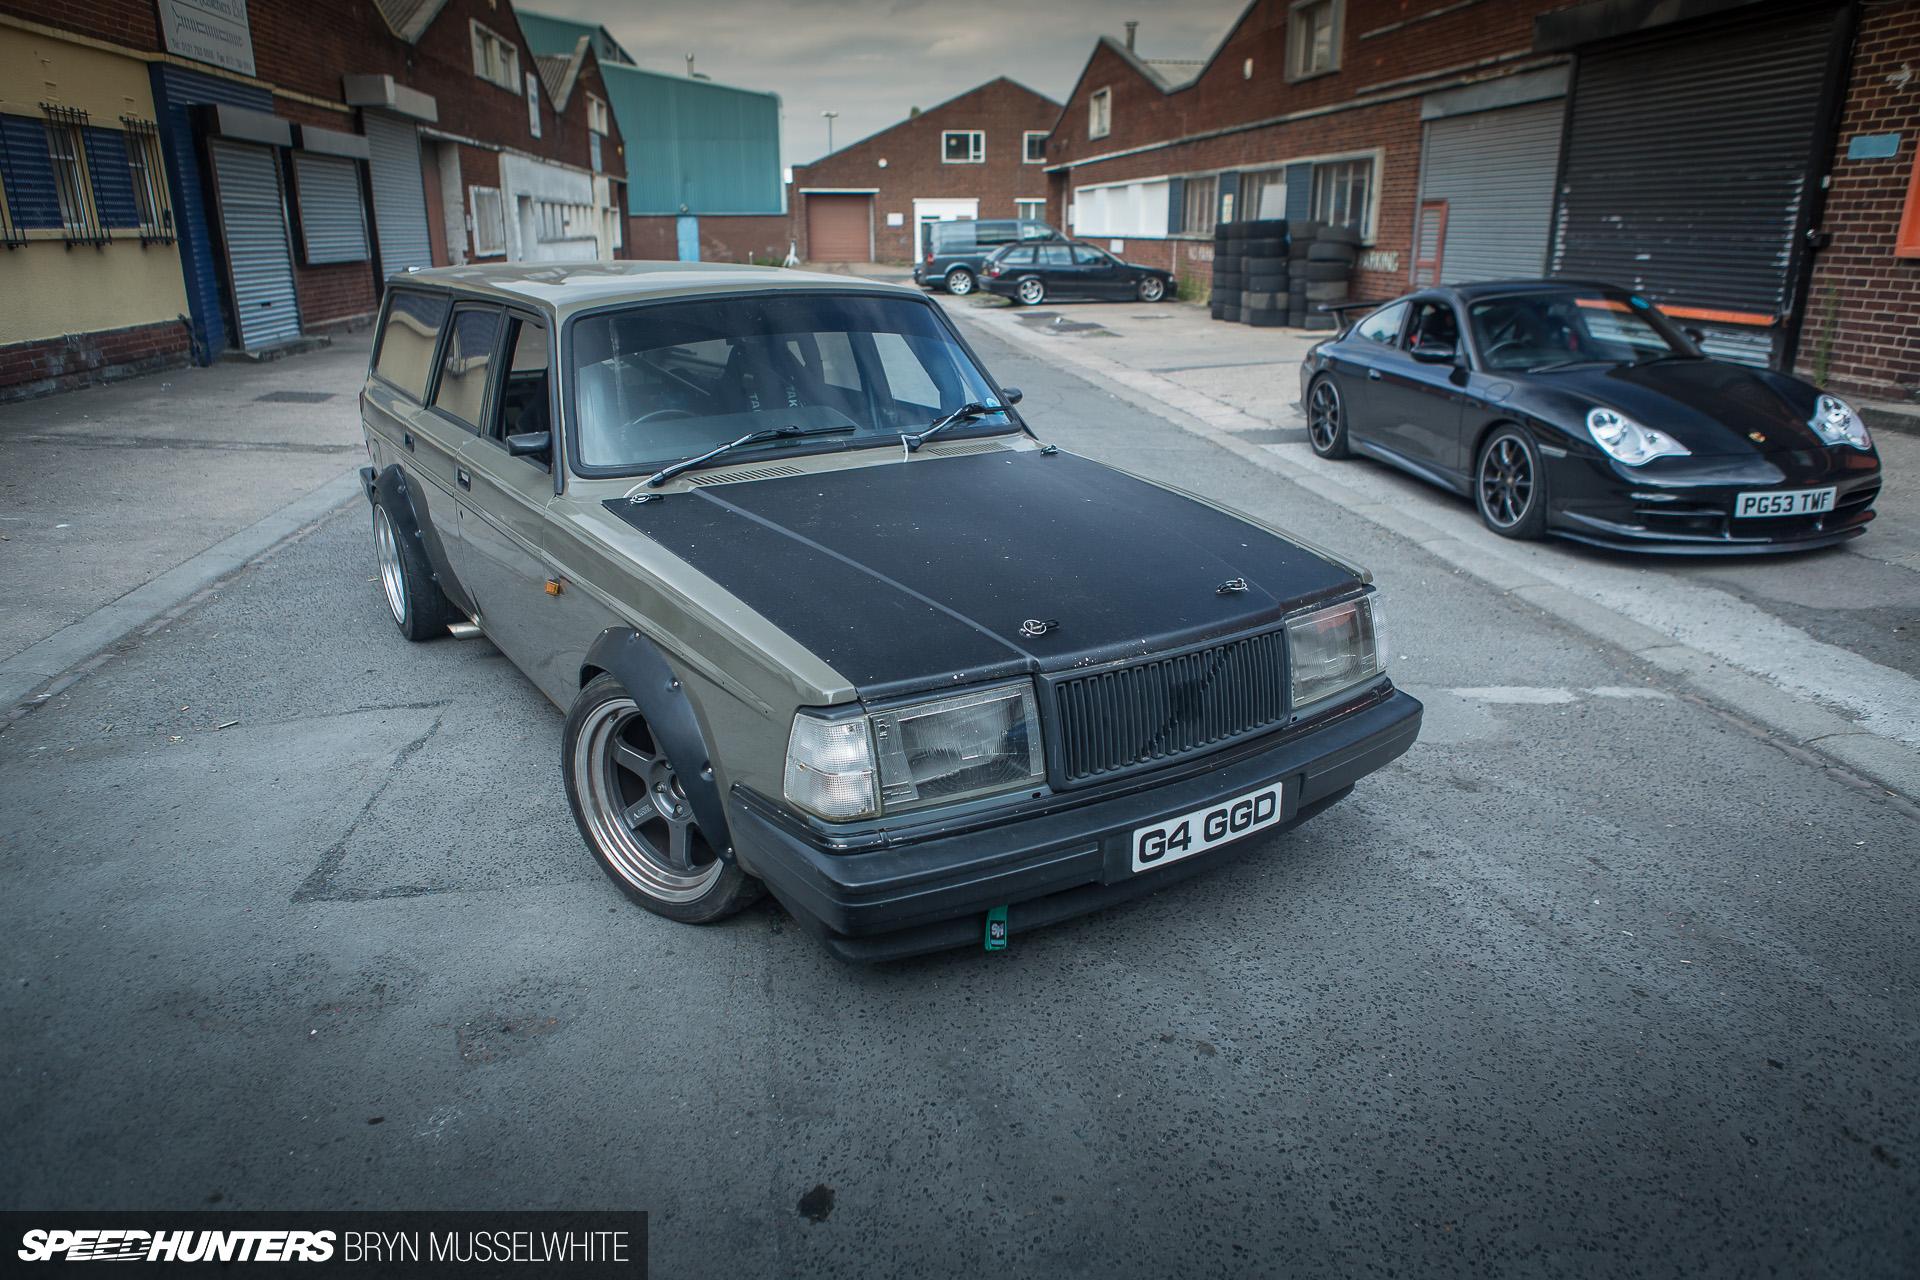 Volvo-turbo-wagon-strip-club-speedhunters-bryn-musselwhite-32-of-179